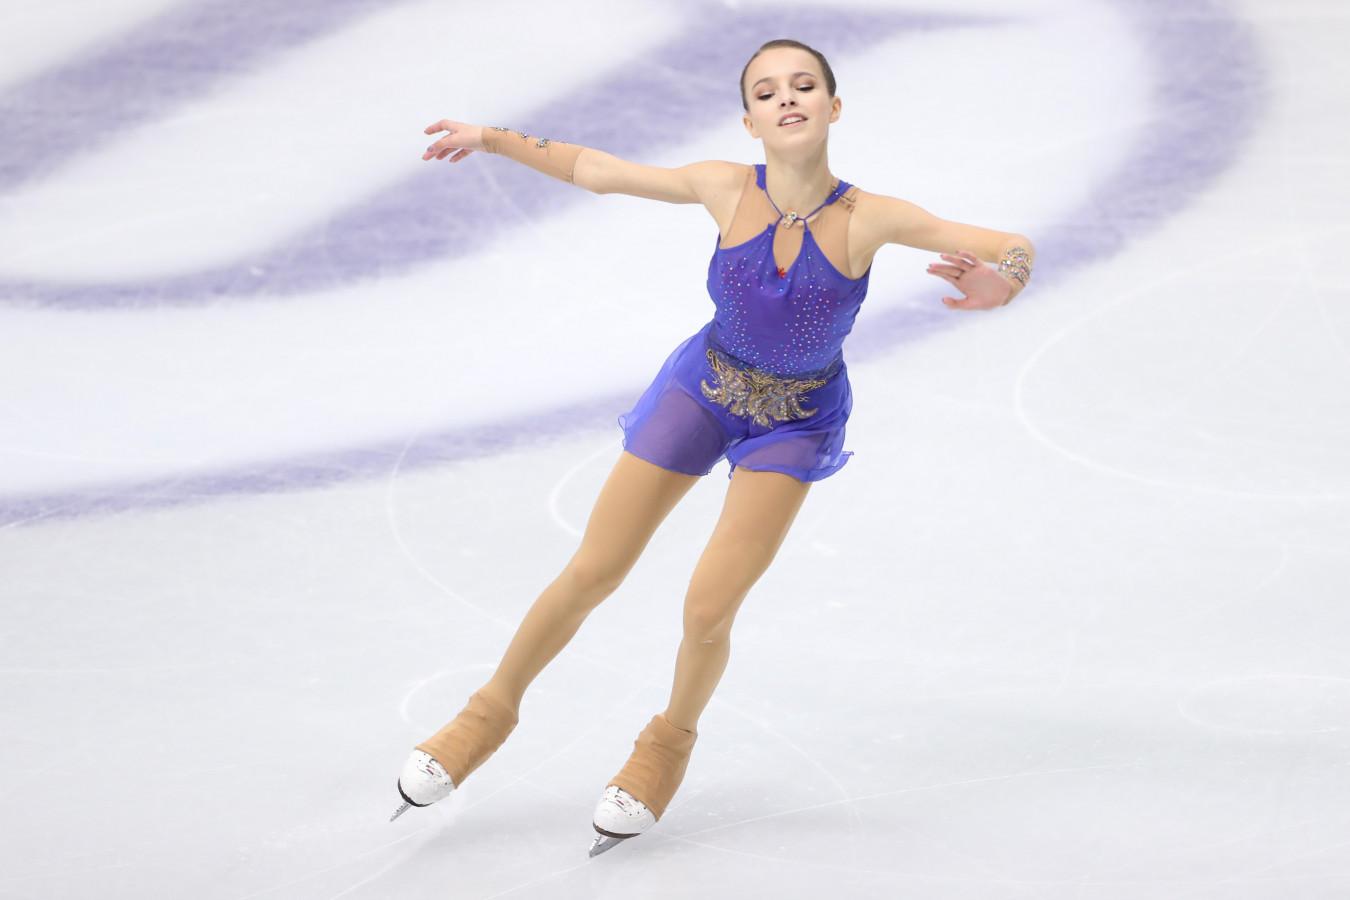 Фигуристка Щербакова выиграла короткую программу на ЧР, Трусова — четвёртая